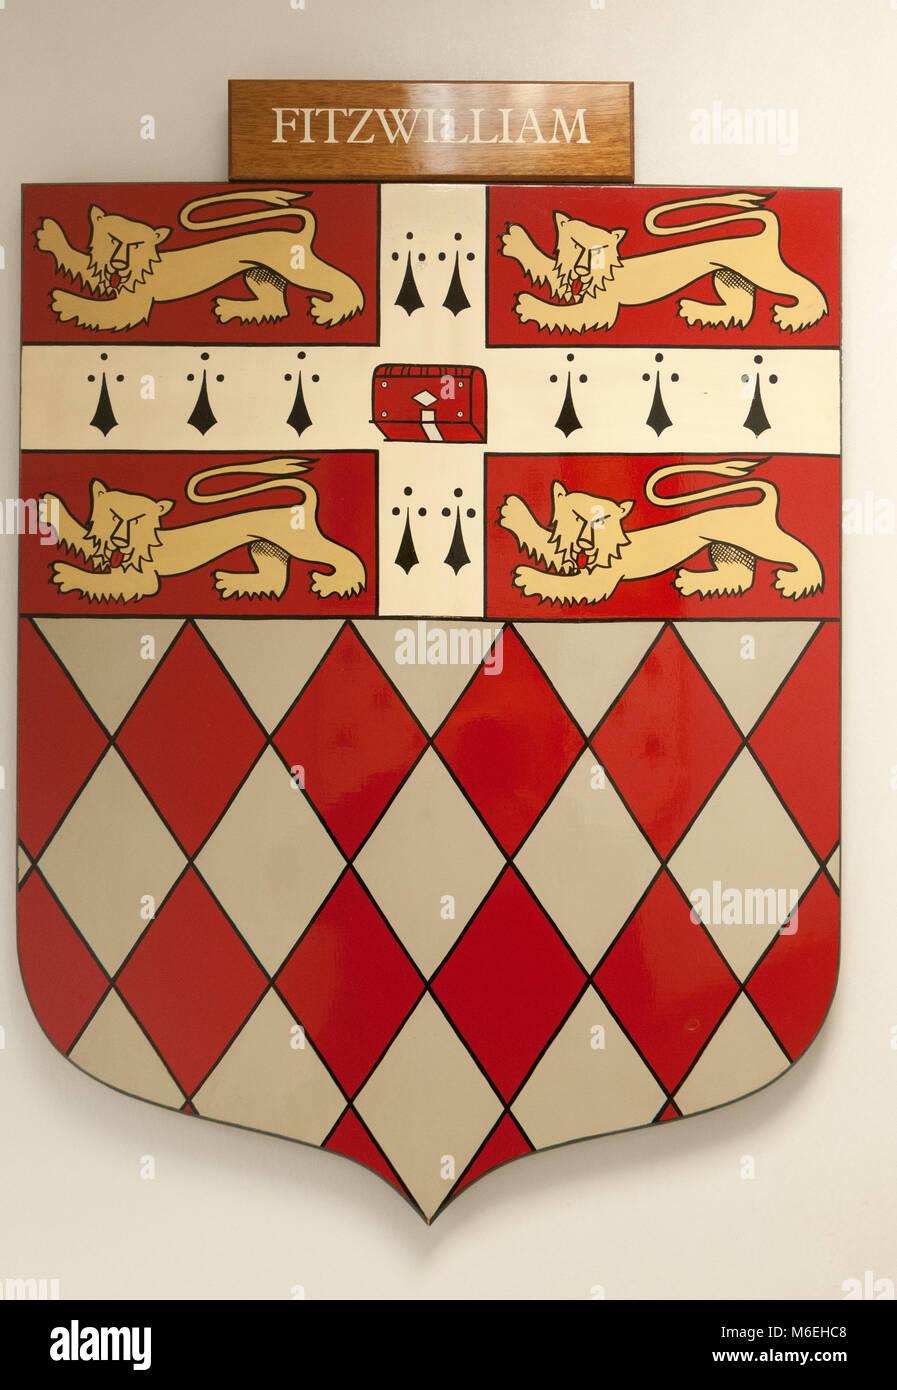 CAMBRIDGE, ENGLAND, UK - DECEMBER 03 2011: Coat of Arms of Fitzwilliam College Cambridge - Stock Image